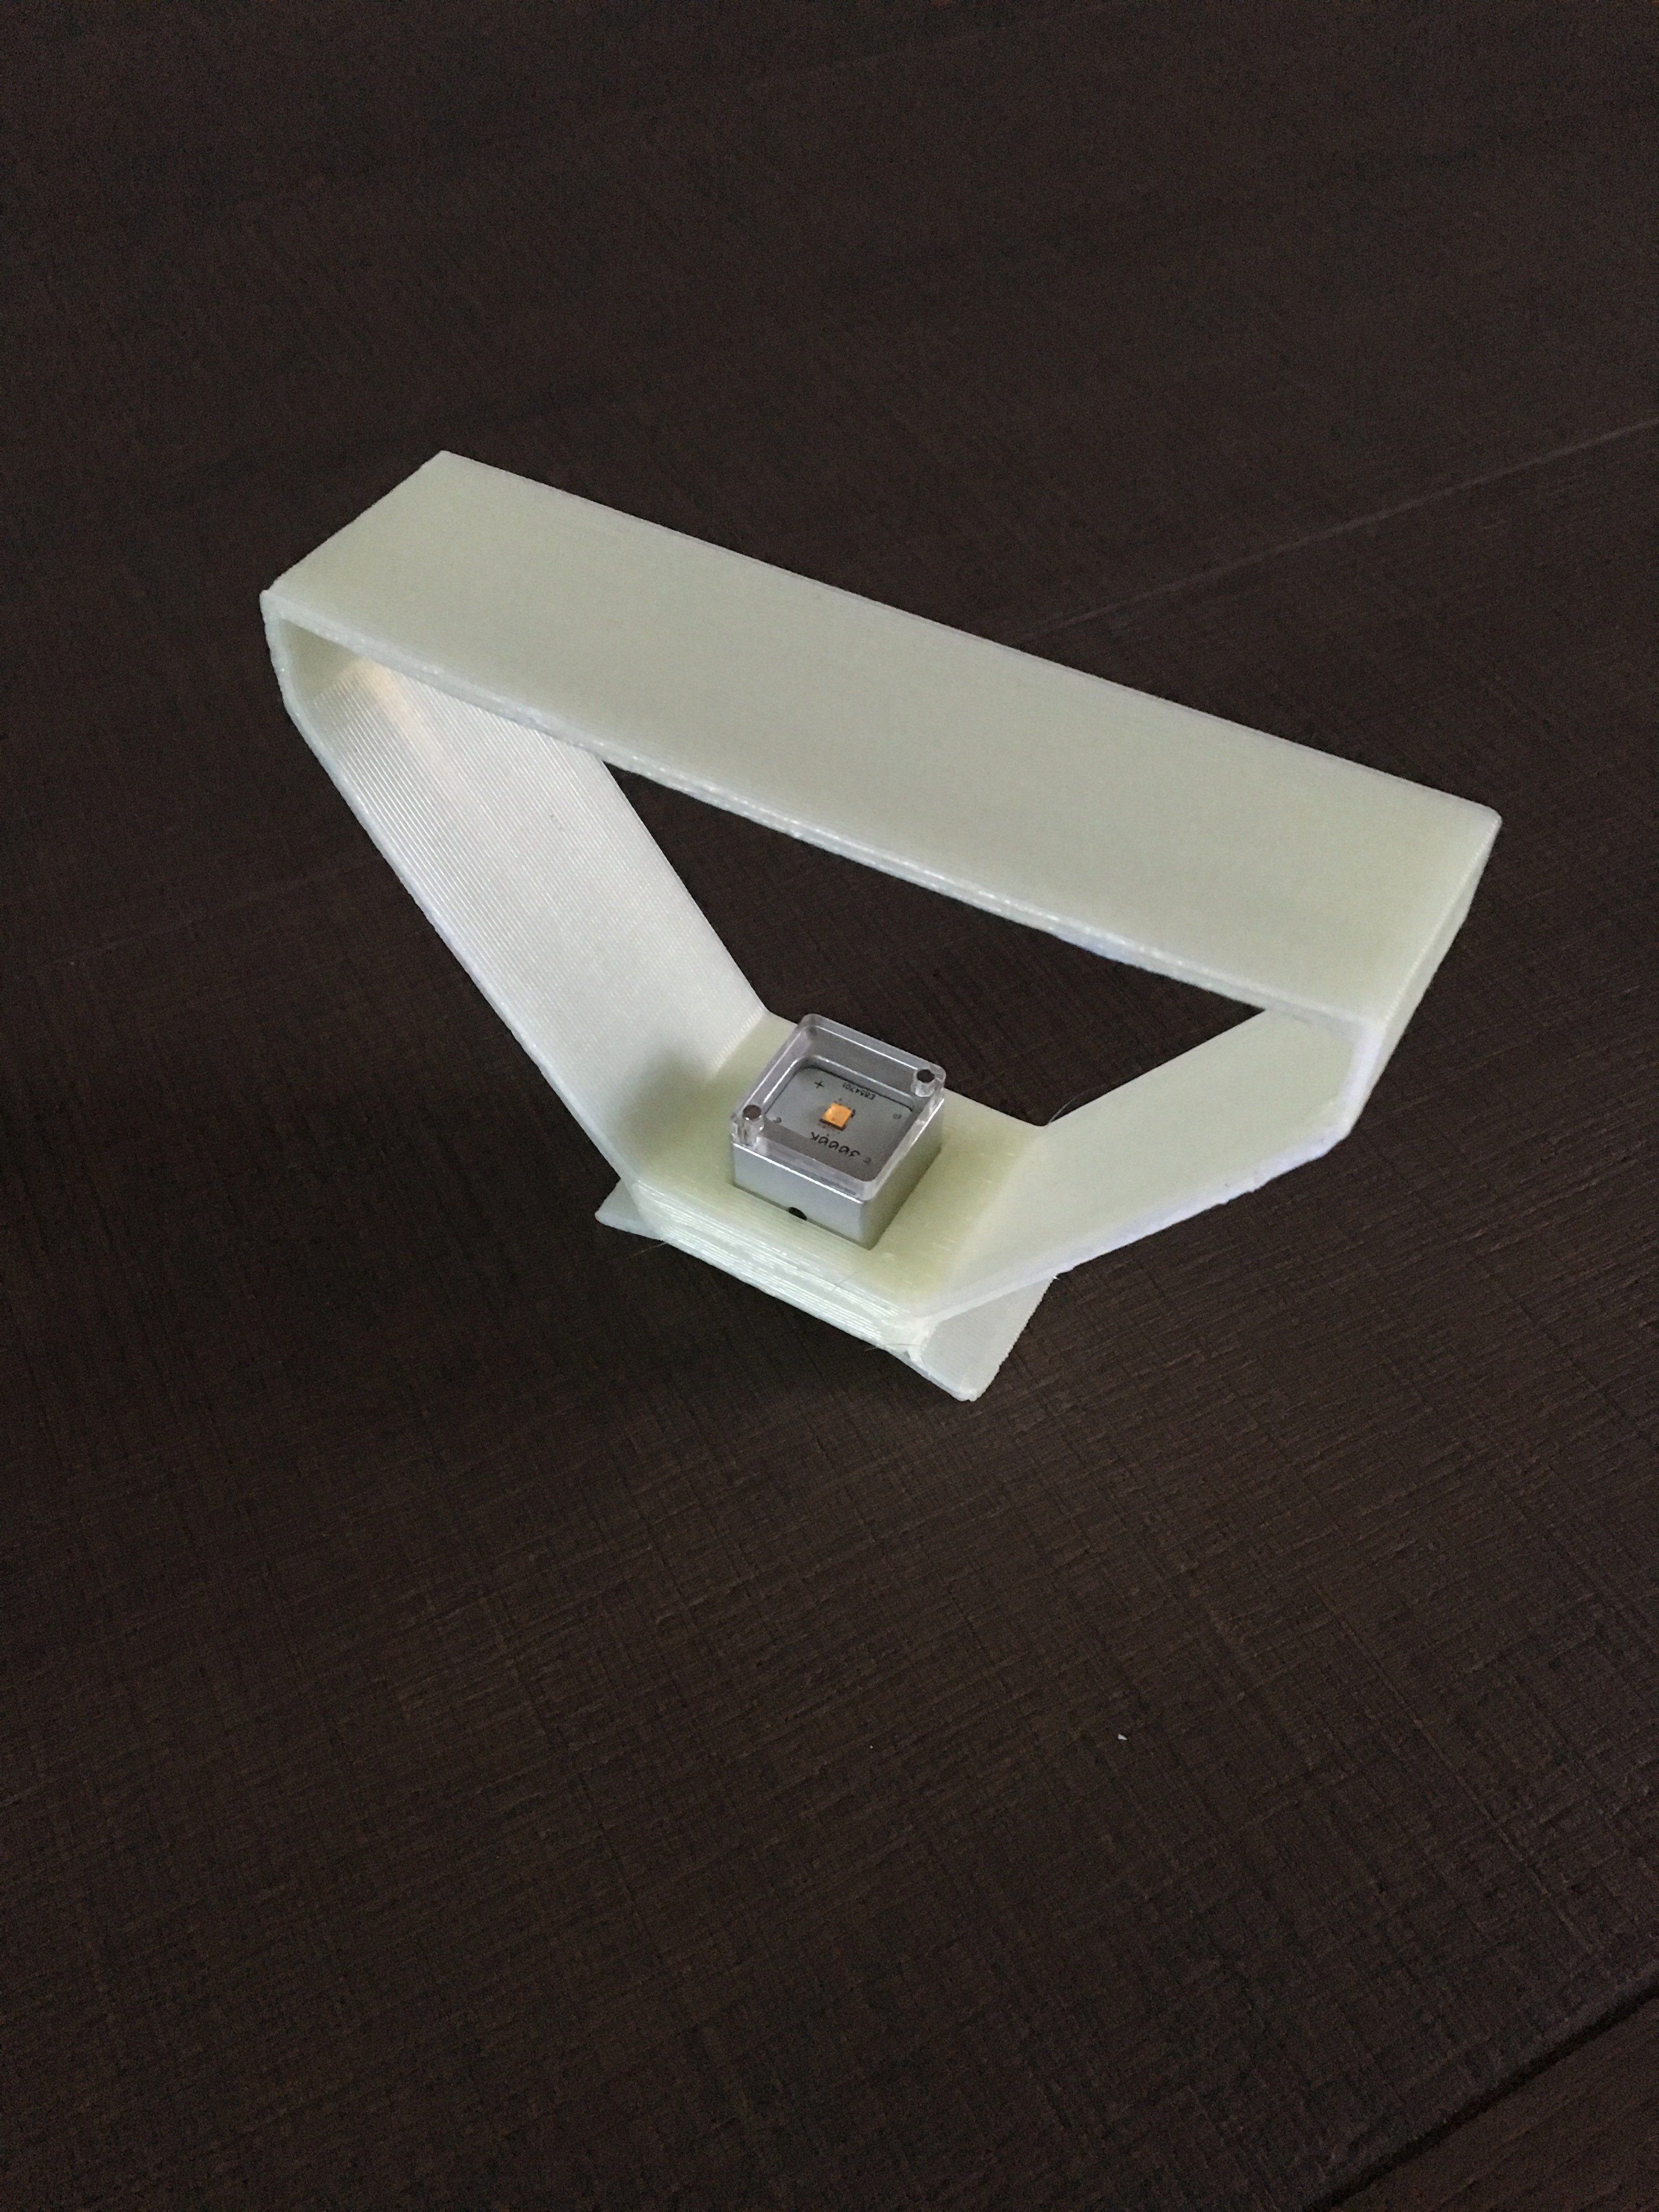 IMG_6731.jpg Download free STL file LED LIGHT • 3D printer model, Byctrldesign